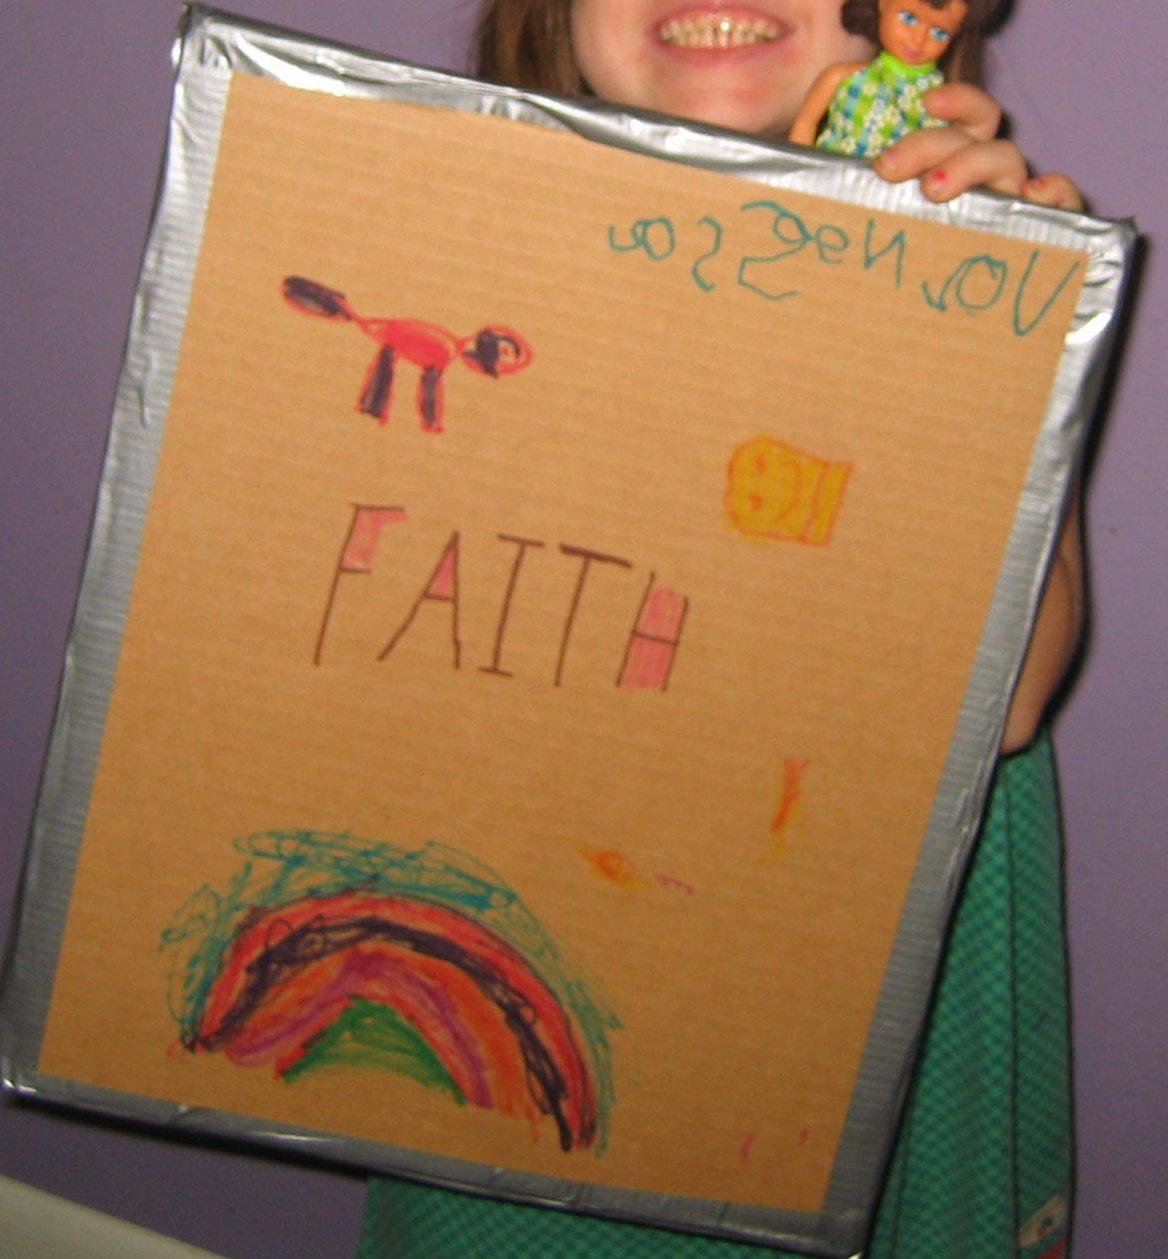 eagle nest mom shield of faith craft for the armor of god